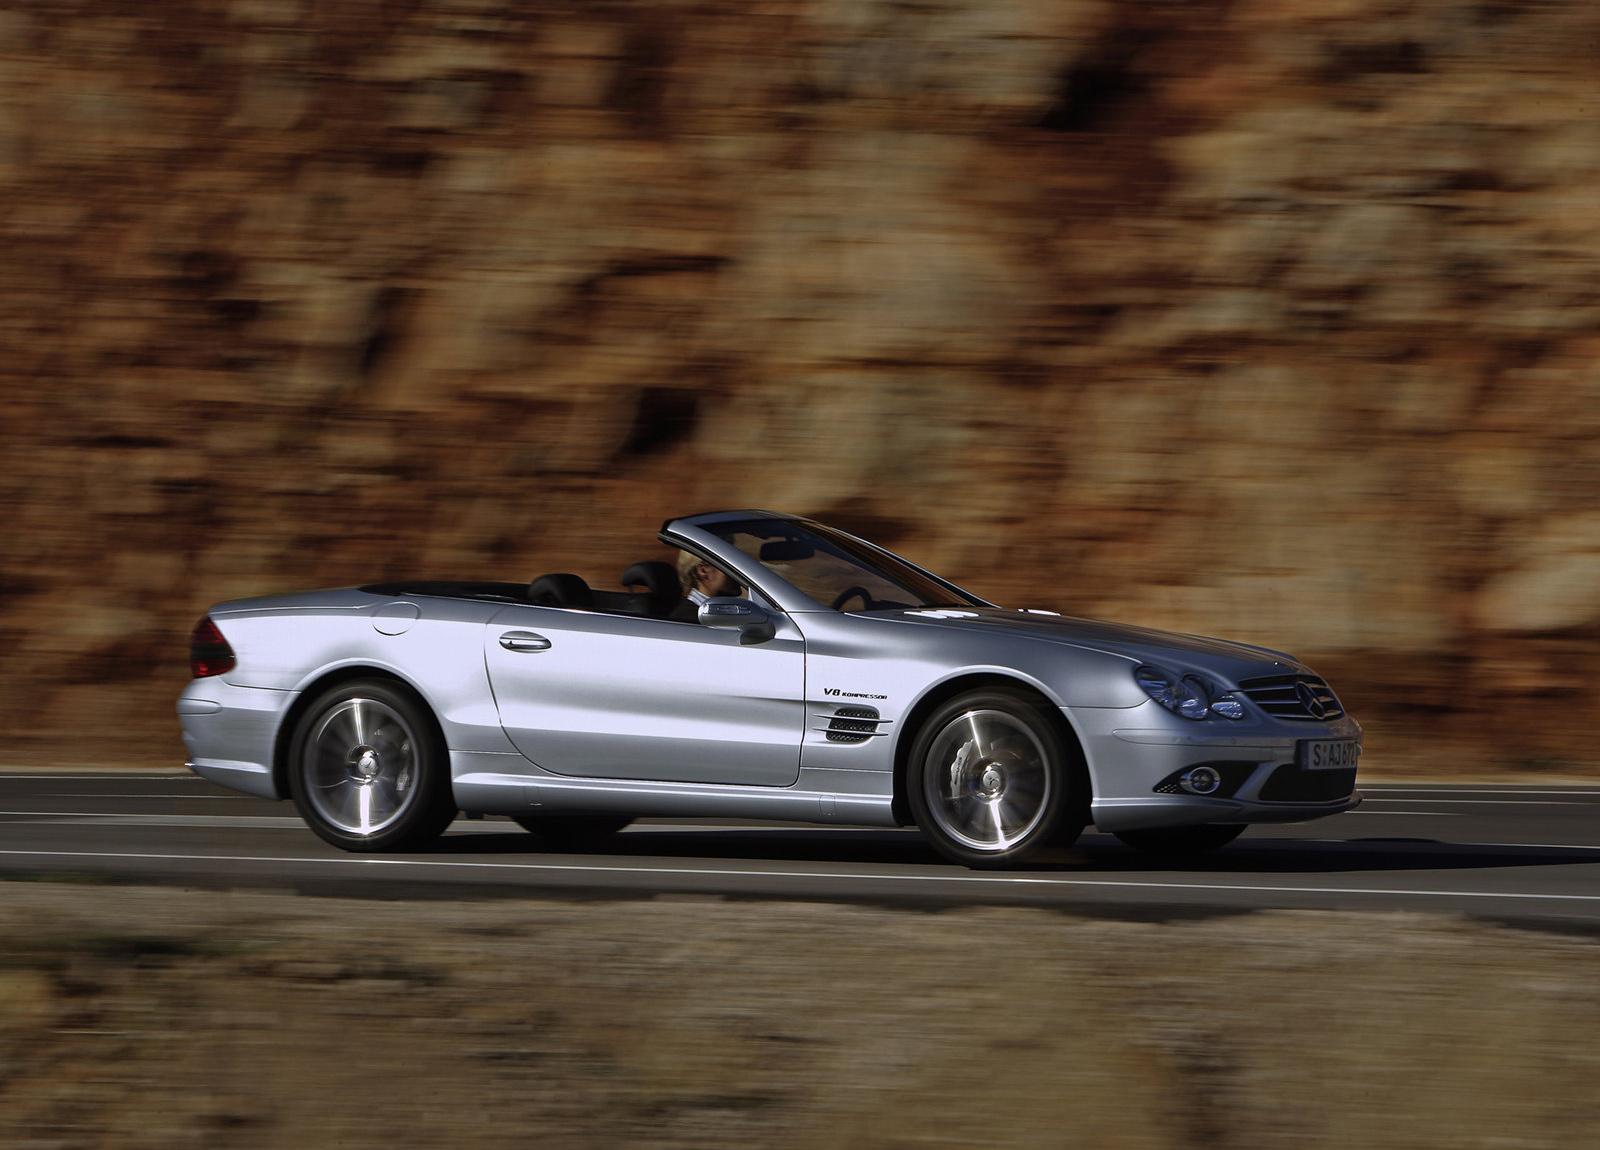 Lotus evora gte limited edition for 2006 mercedes benz sl55 amg